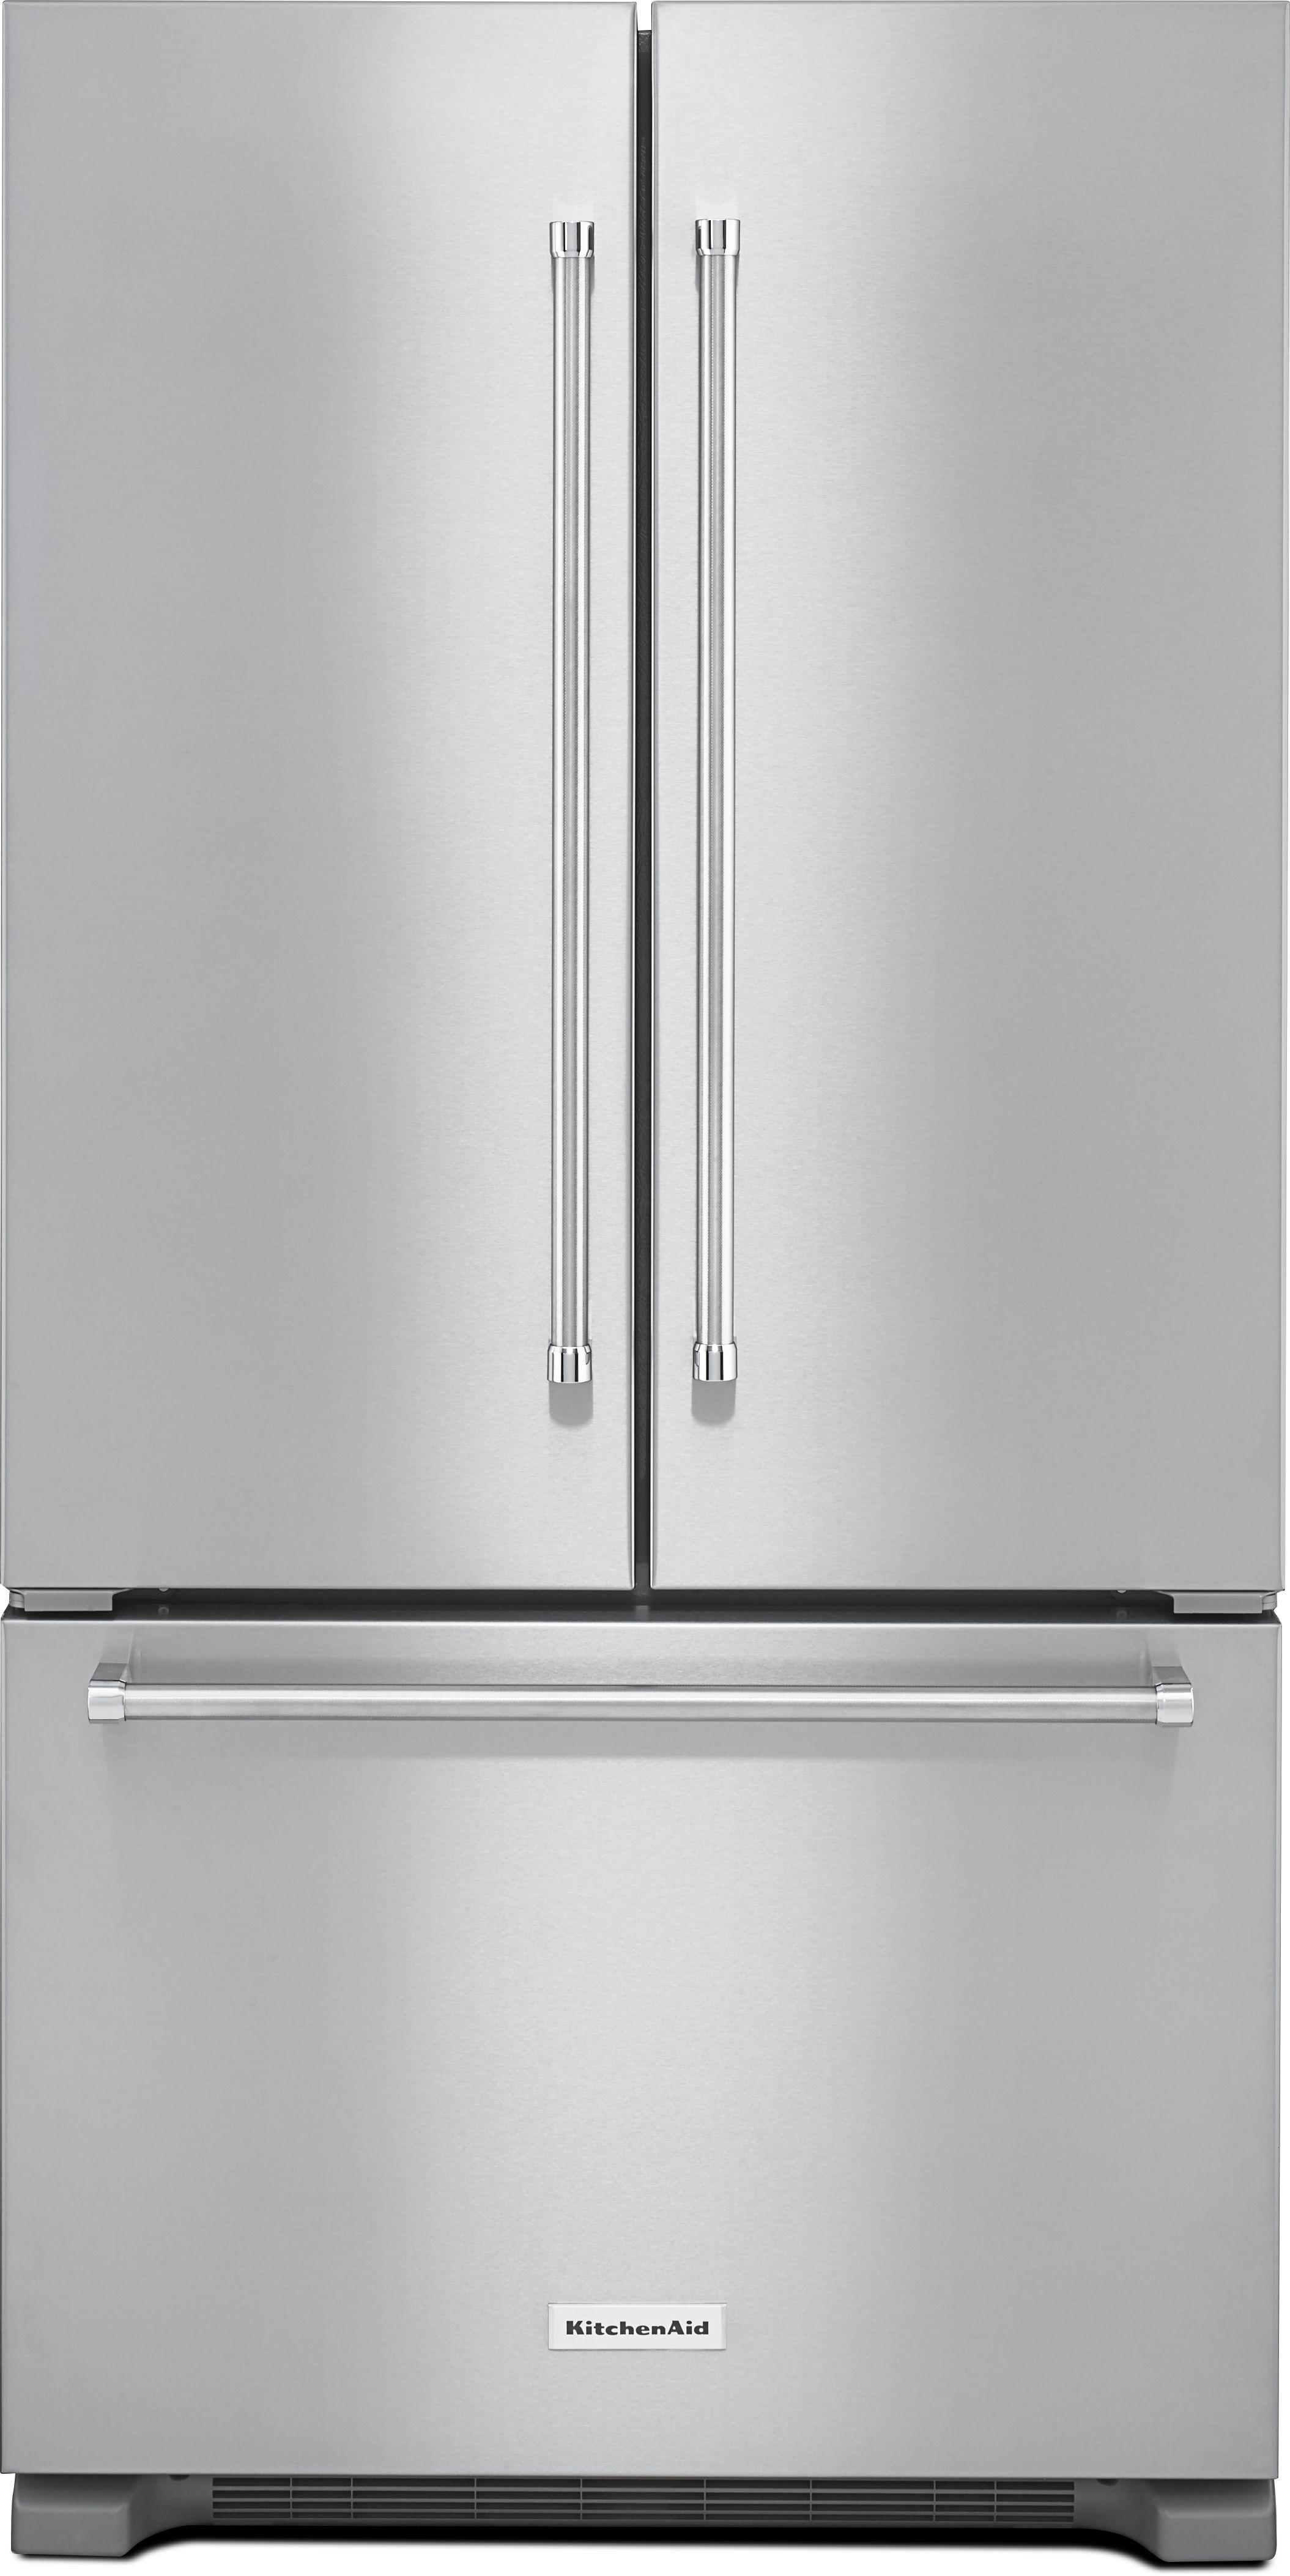 Ft. French Door Refrigerator Stainless Steel KRFC302ESS